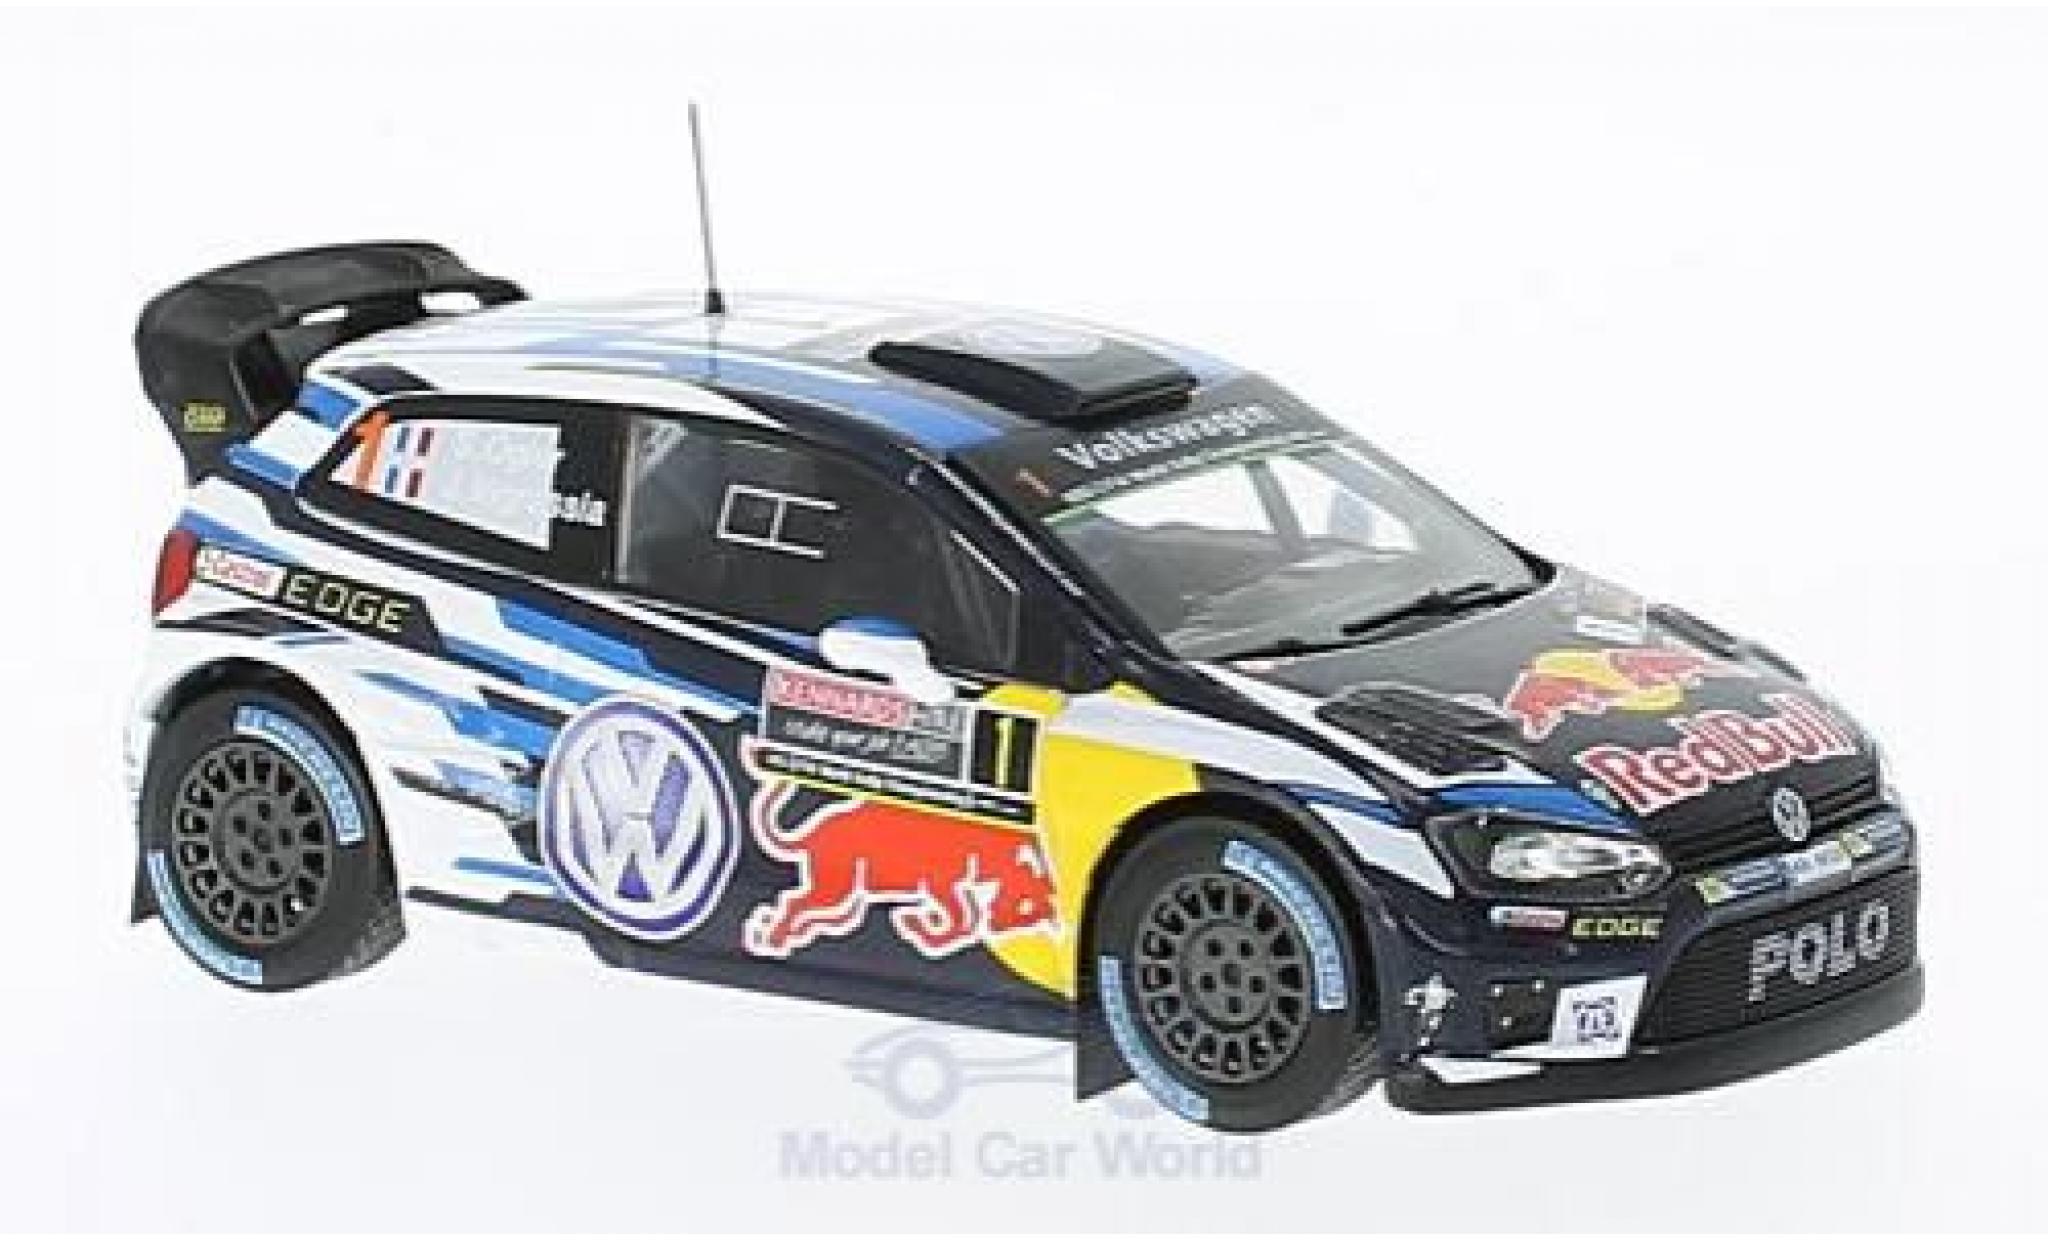 Volkswagen Polo 1/43 IXO R WRC No.1 Motorsport Red Bull Rallye WM Rallye Australien 2016 S.Ogier/J.Ingrassia